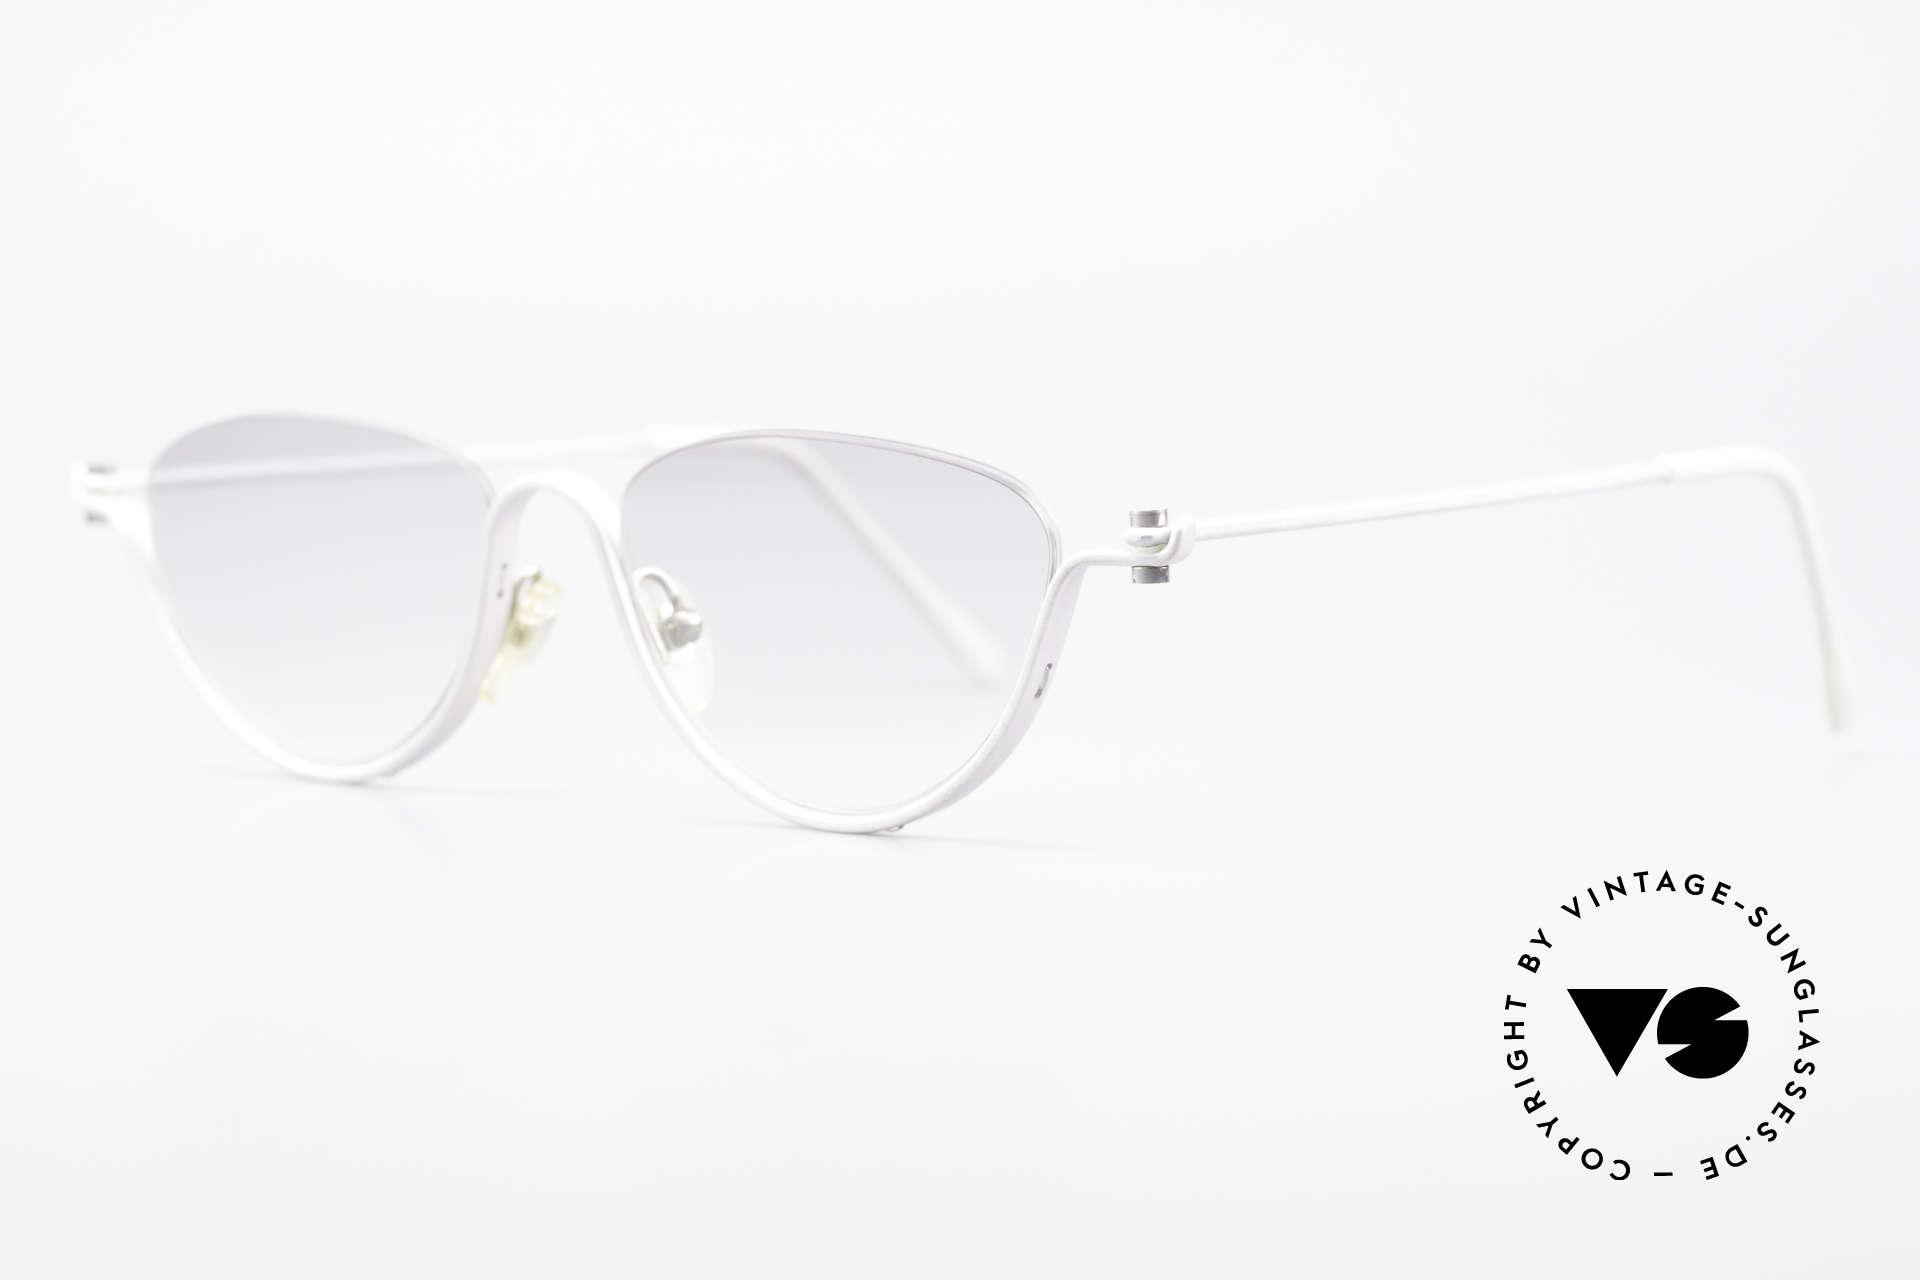 ProDesign No10 Gail Spence Design Sunglasses, successor of the legendary Pro Design N° ONE model, Made for Women